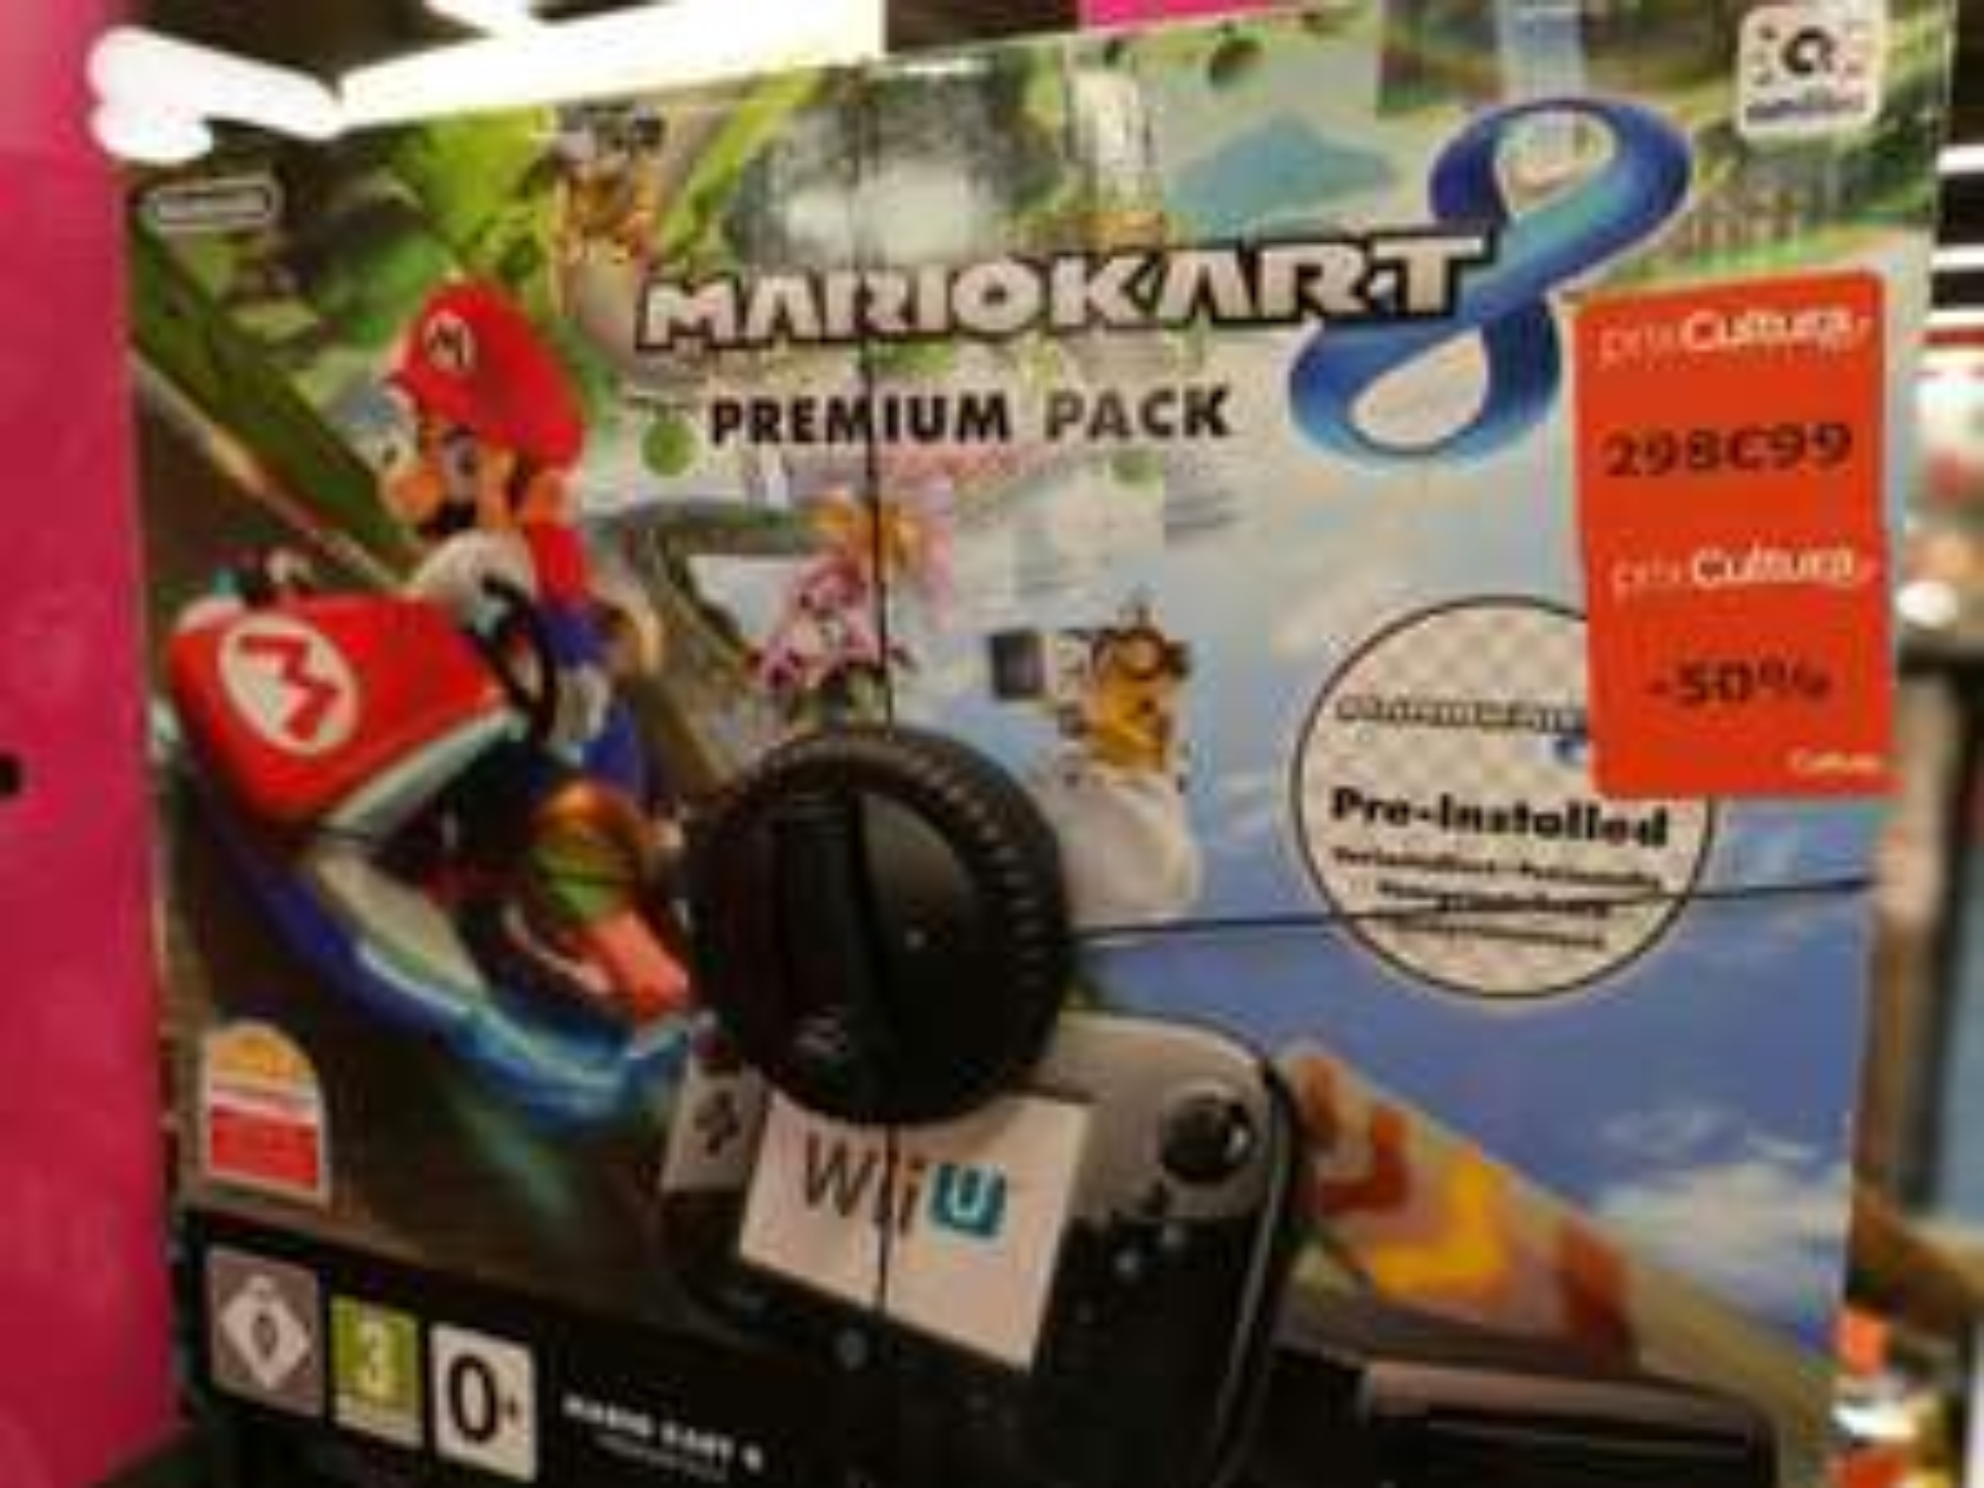 Console Wii U 32Go avec Mario Kart 8 - Brest (29)